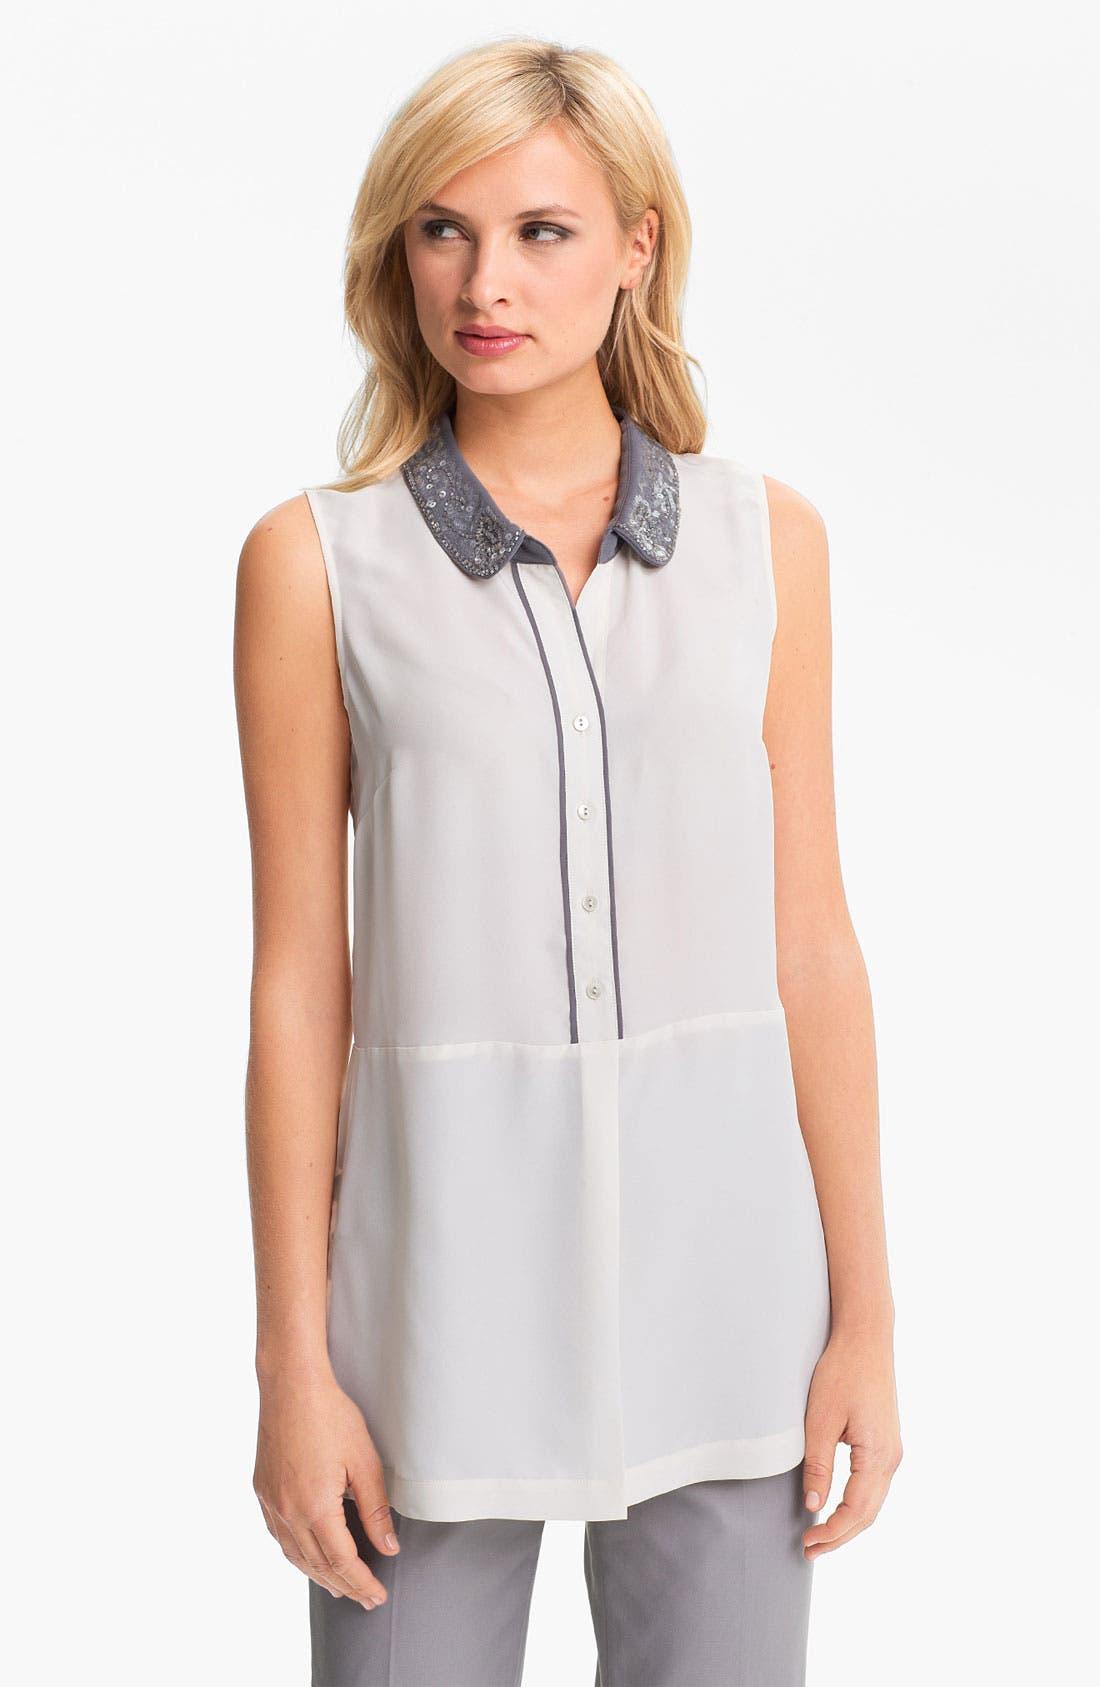 Main Image - Nic + Zoe Sequin Collar Sleeveless Blouse (Petite)